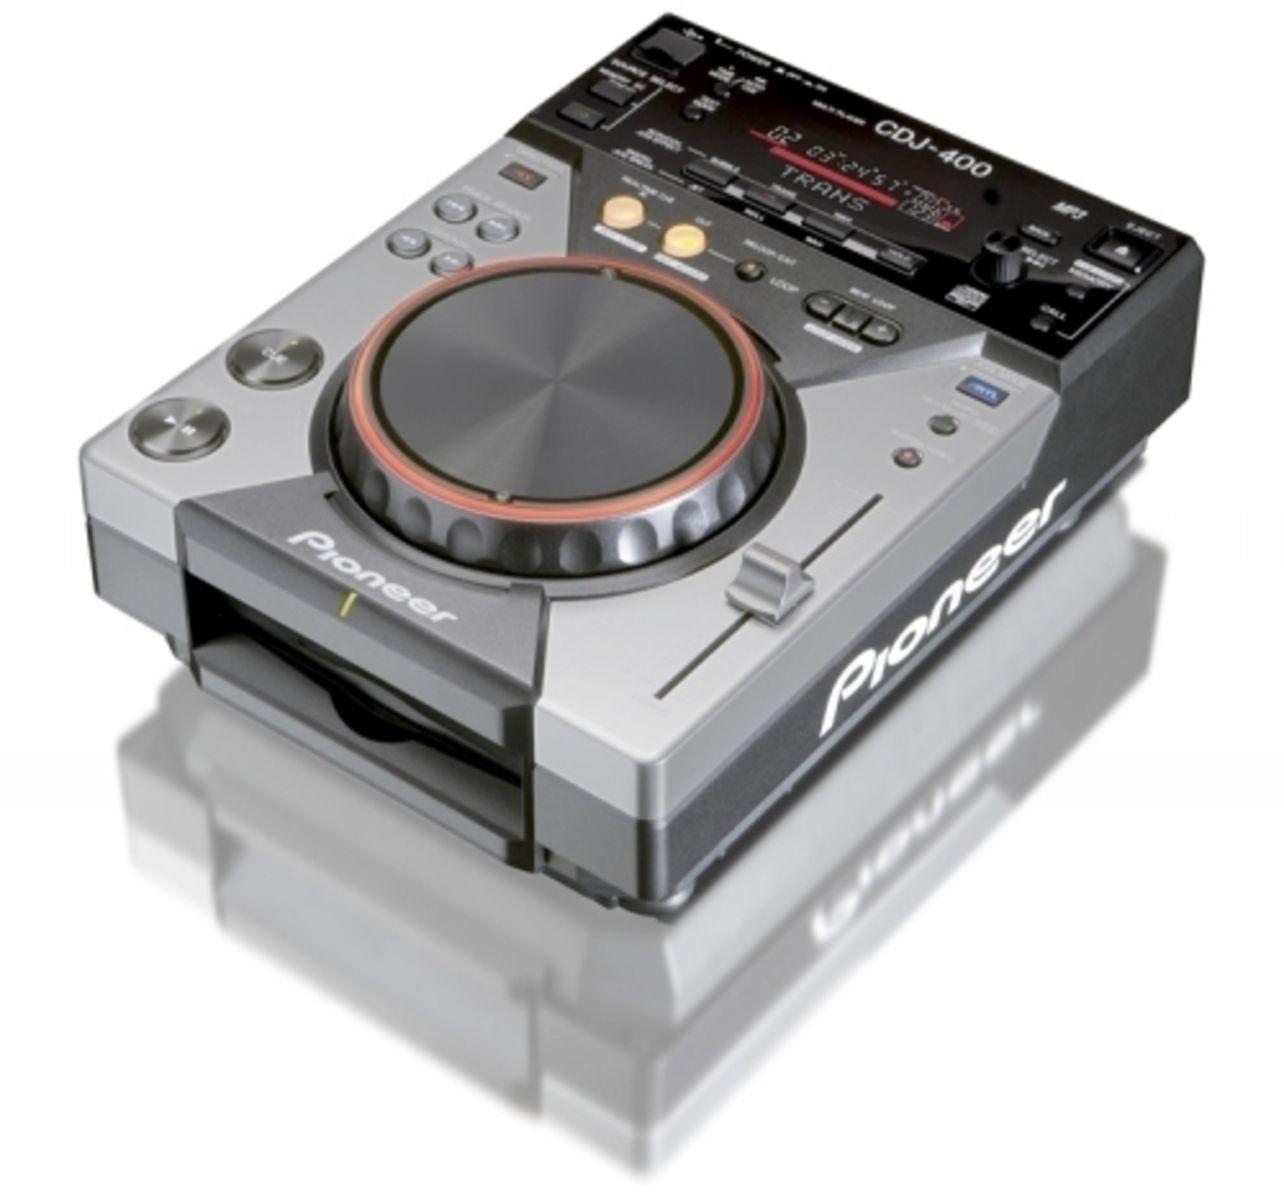 Pioneer Cdj 500 Mk2 Image 18140 Audiofanzine